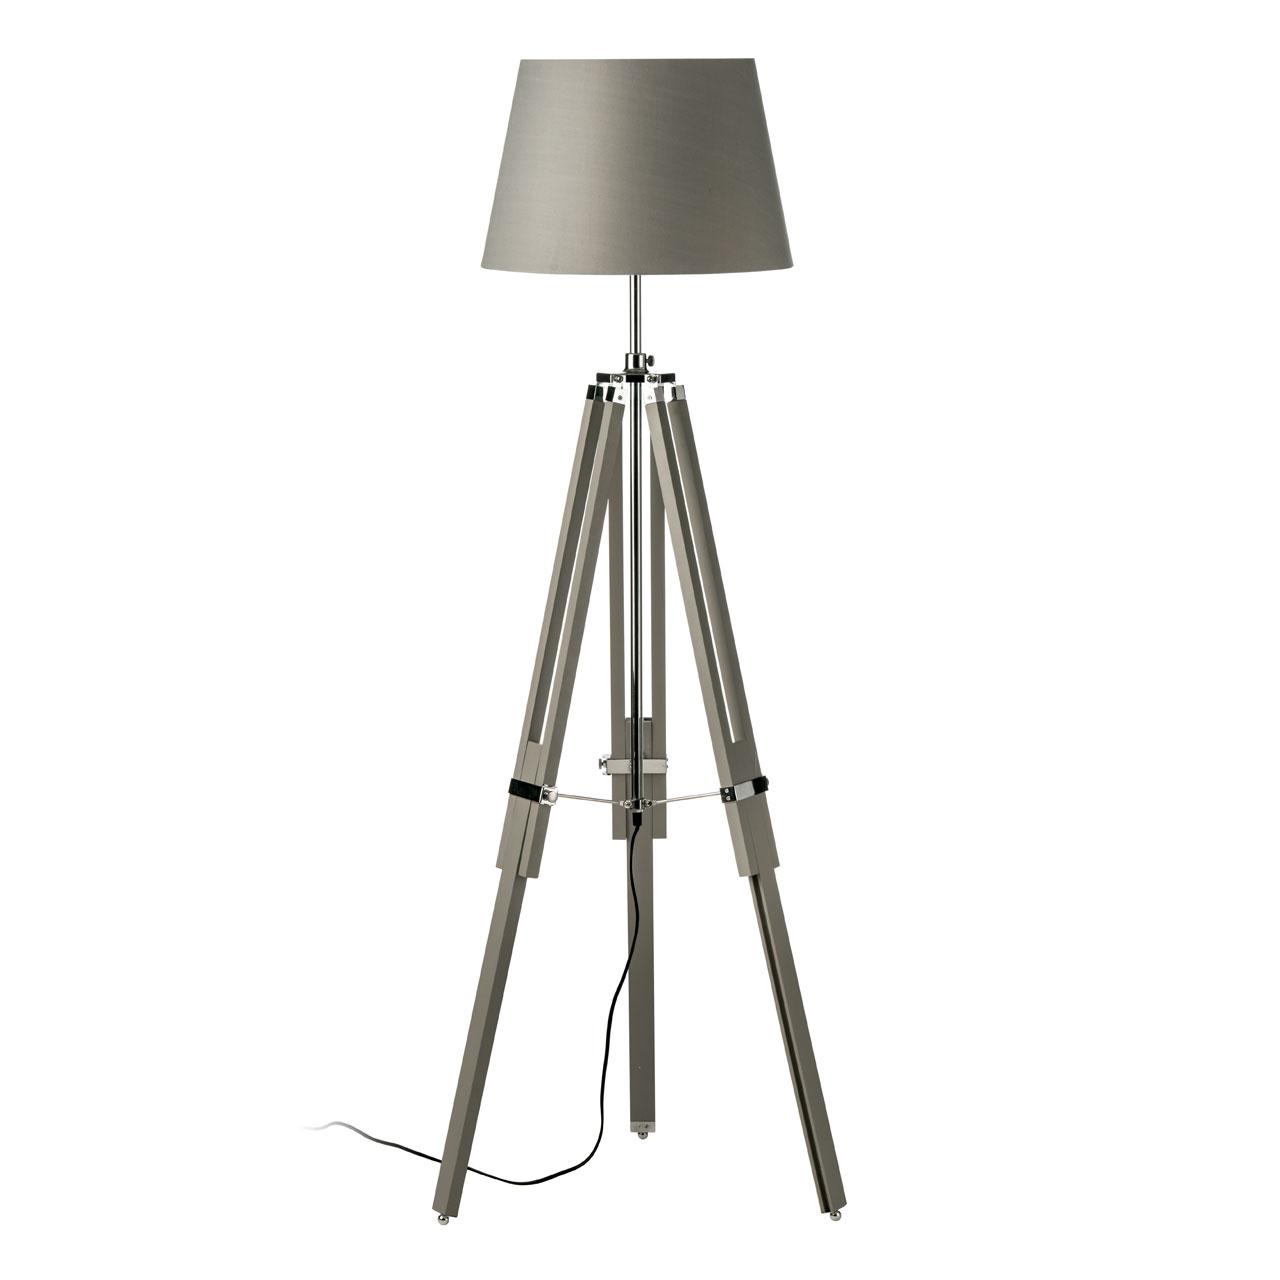 Jasper 1920 Floor Lamp